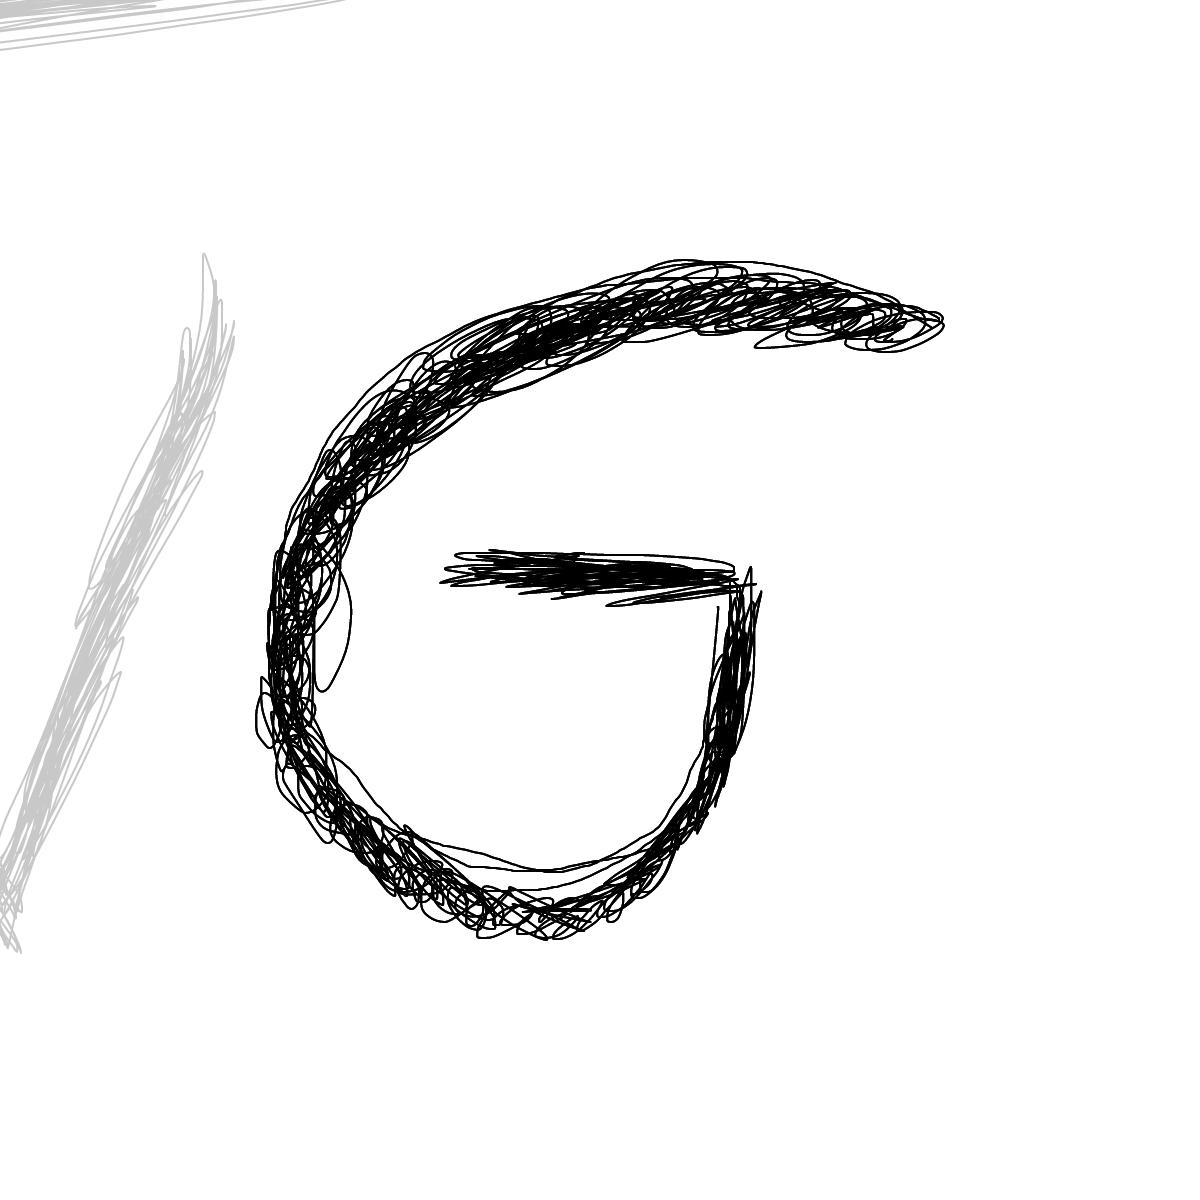 BAAAM drawing#8597 lat:59.9170150756835940lng: 10.7277889251708980